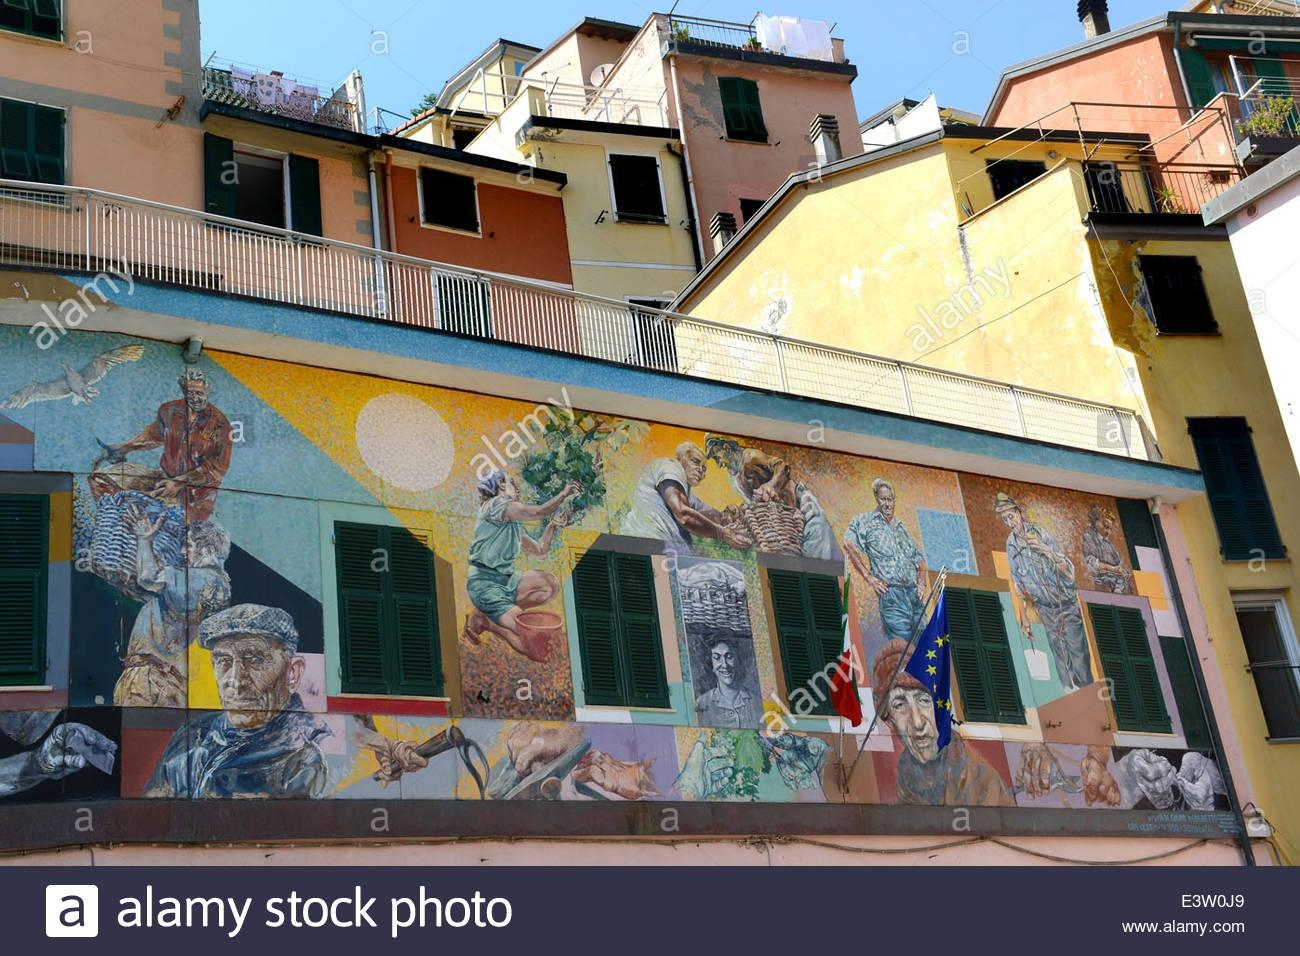 Italian Street Art Murals Mural At Riomaggiore On The Cinque Terre Inside Italian Art Wall Murals (Image 8 of 20)